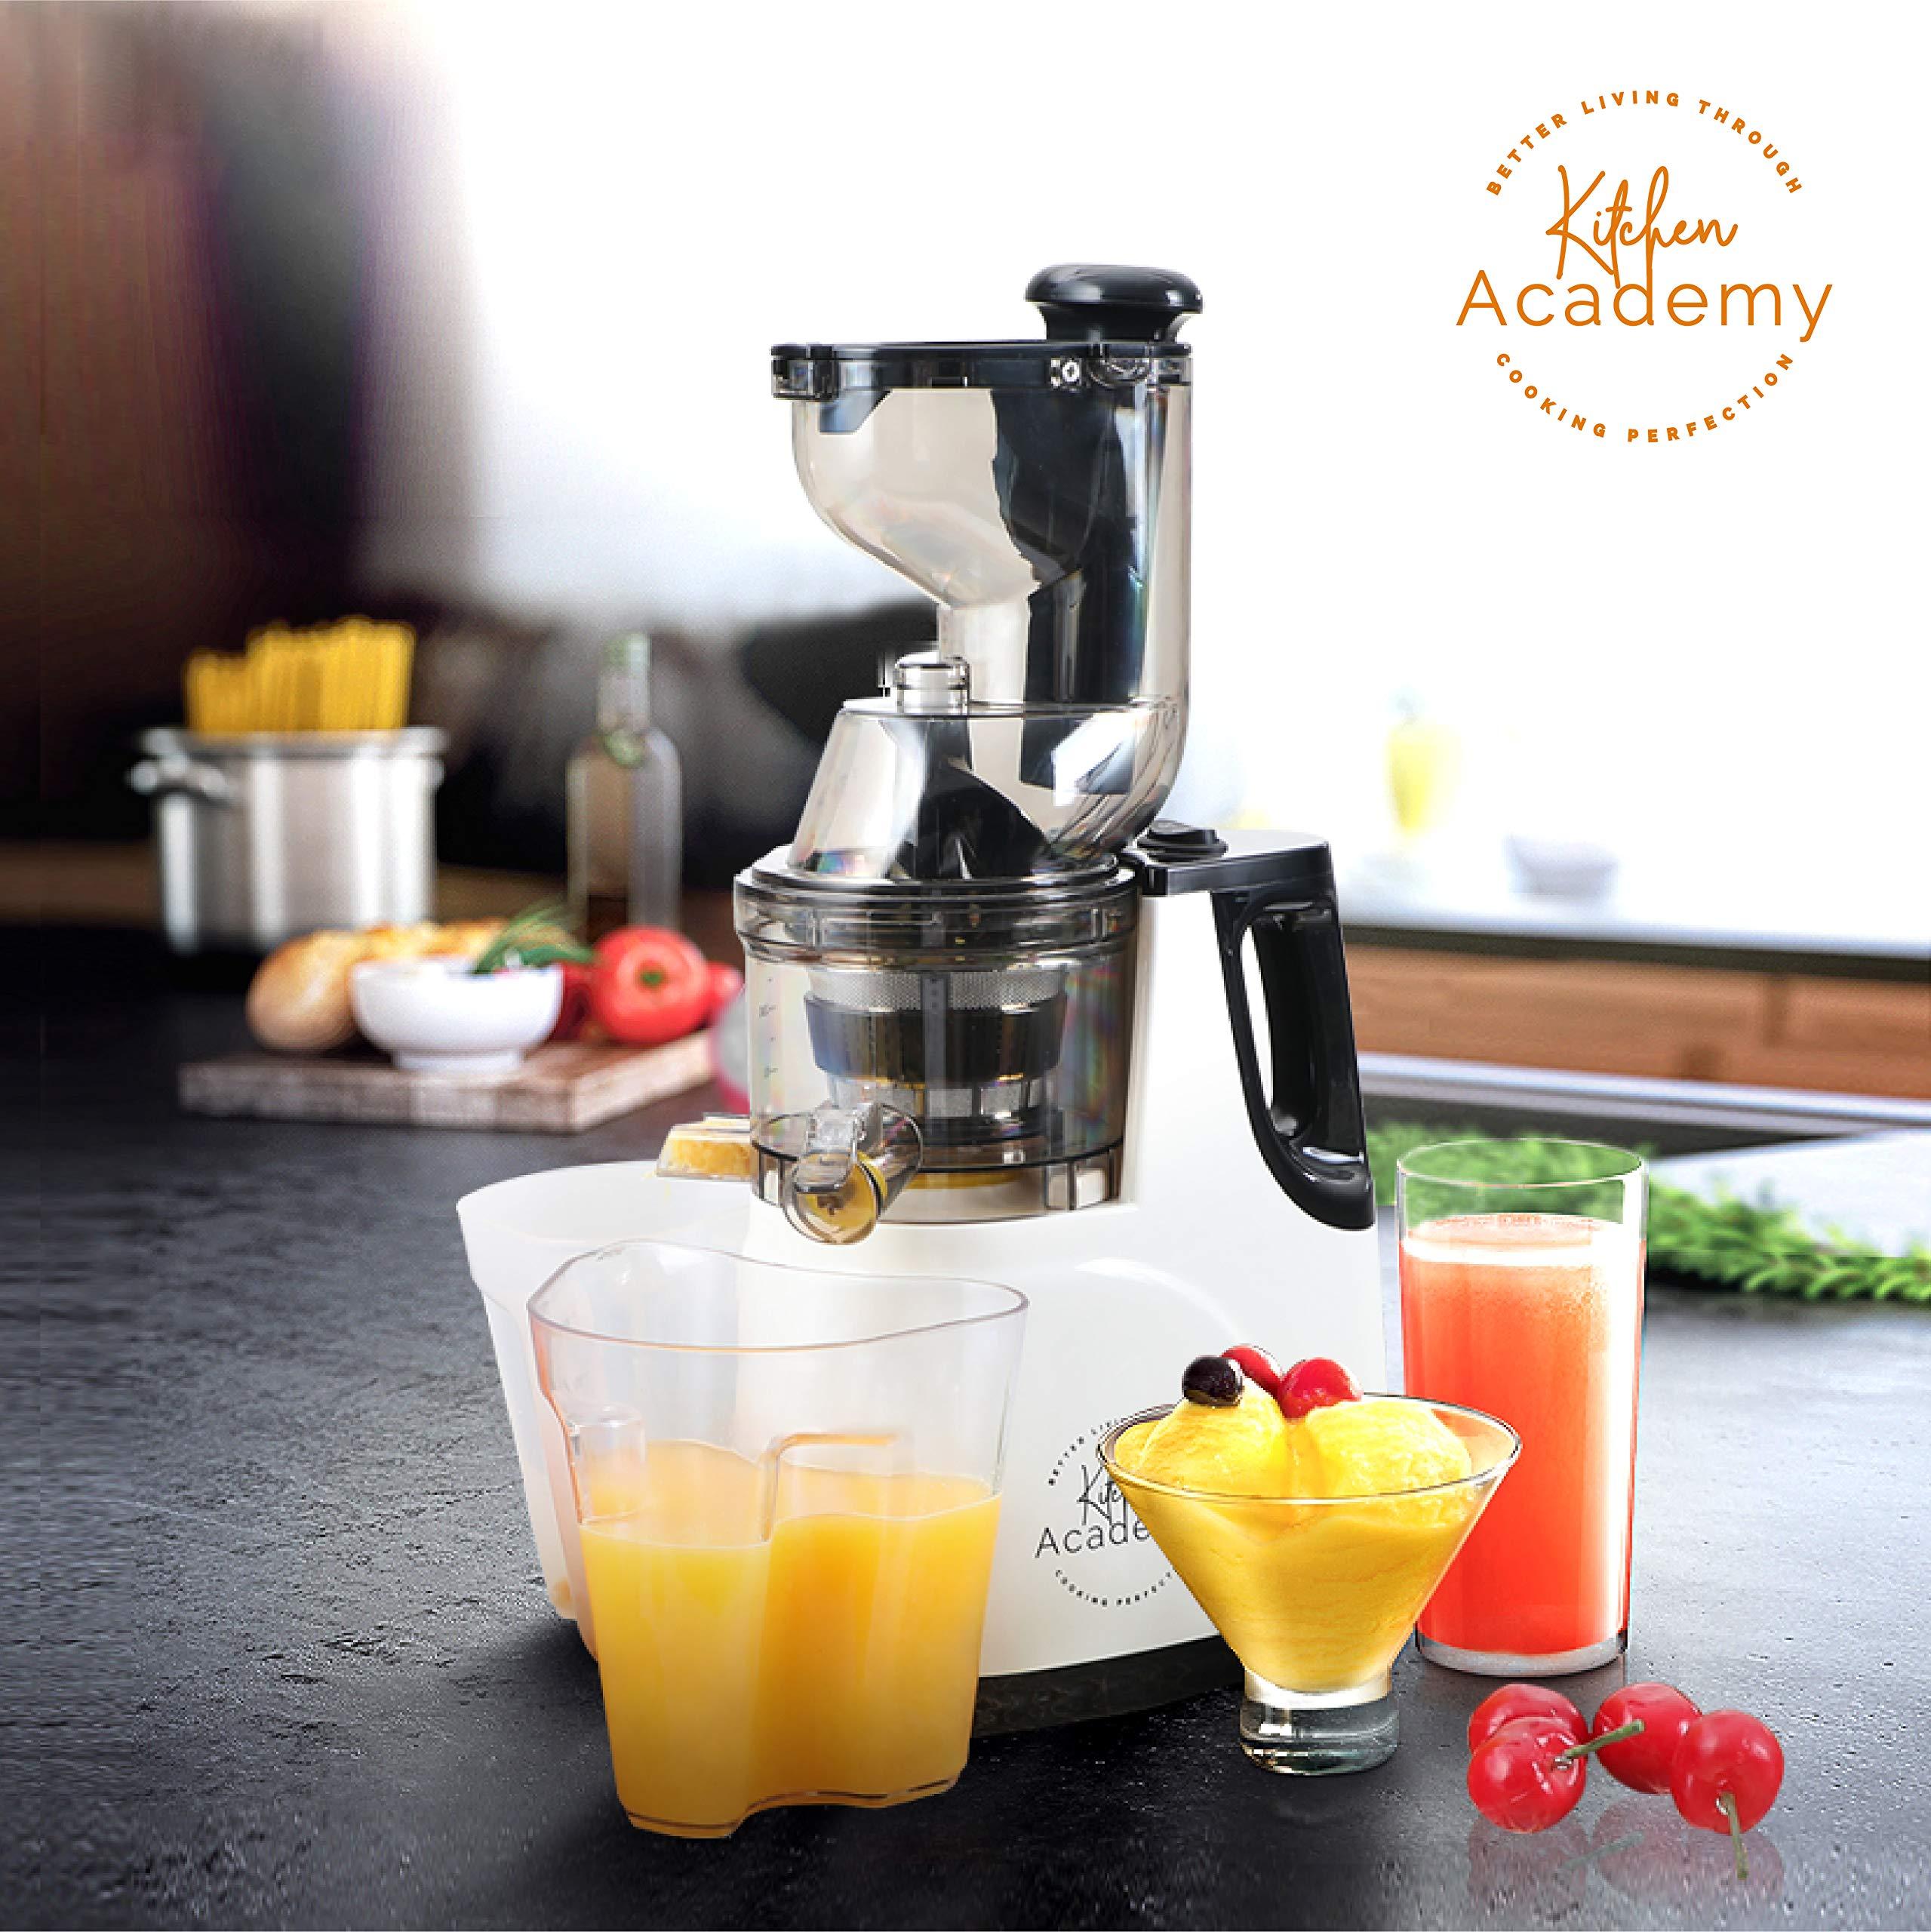 Kitchen Academy Slow Juicer, Large Feed Chute Masticating Juicer Machine, Ultra Efficient 150W, 60 RPMs, Ceramic White - Ceramic White